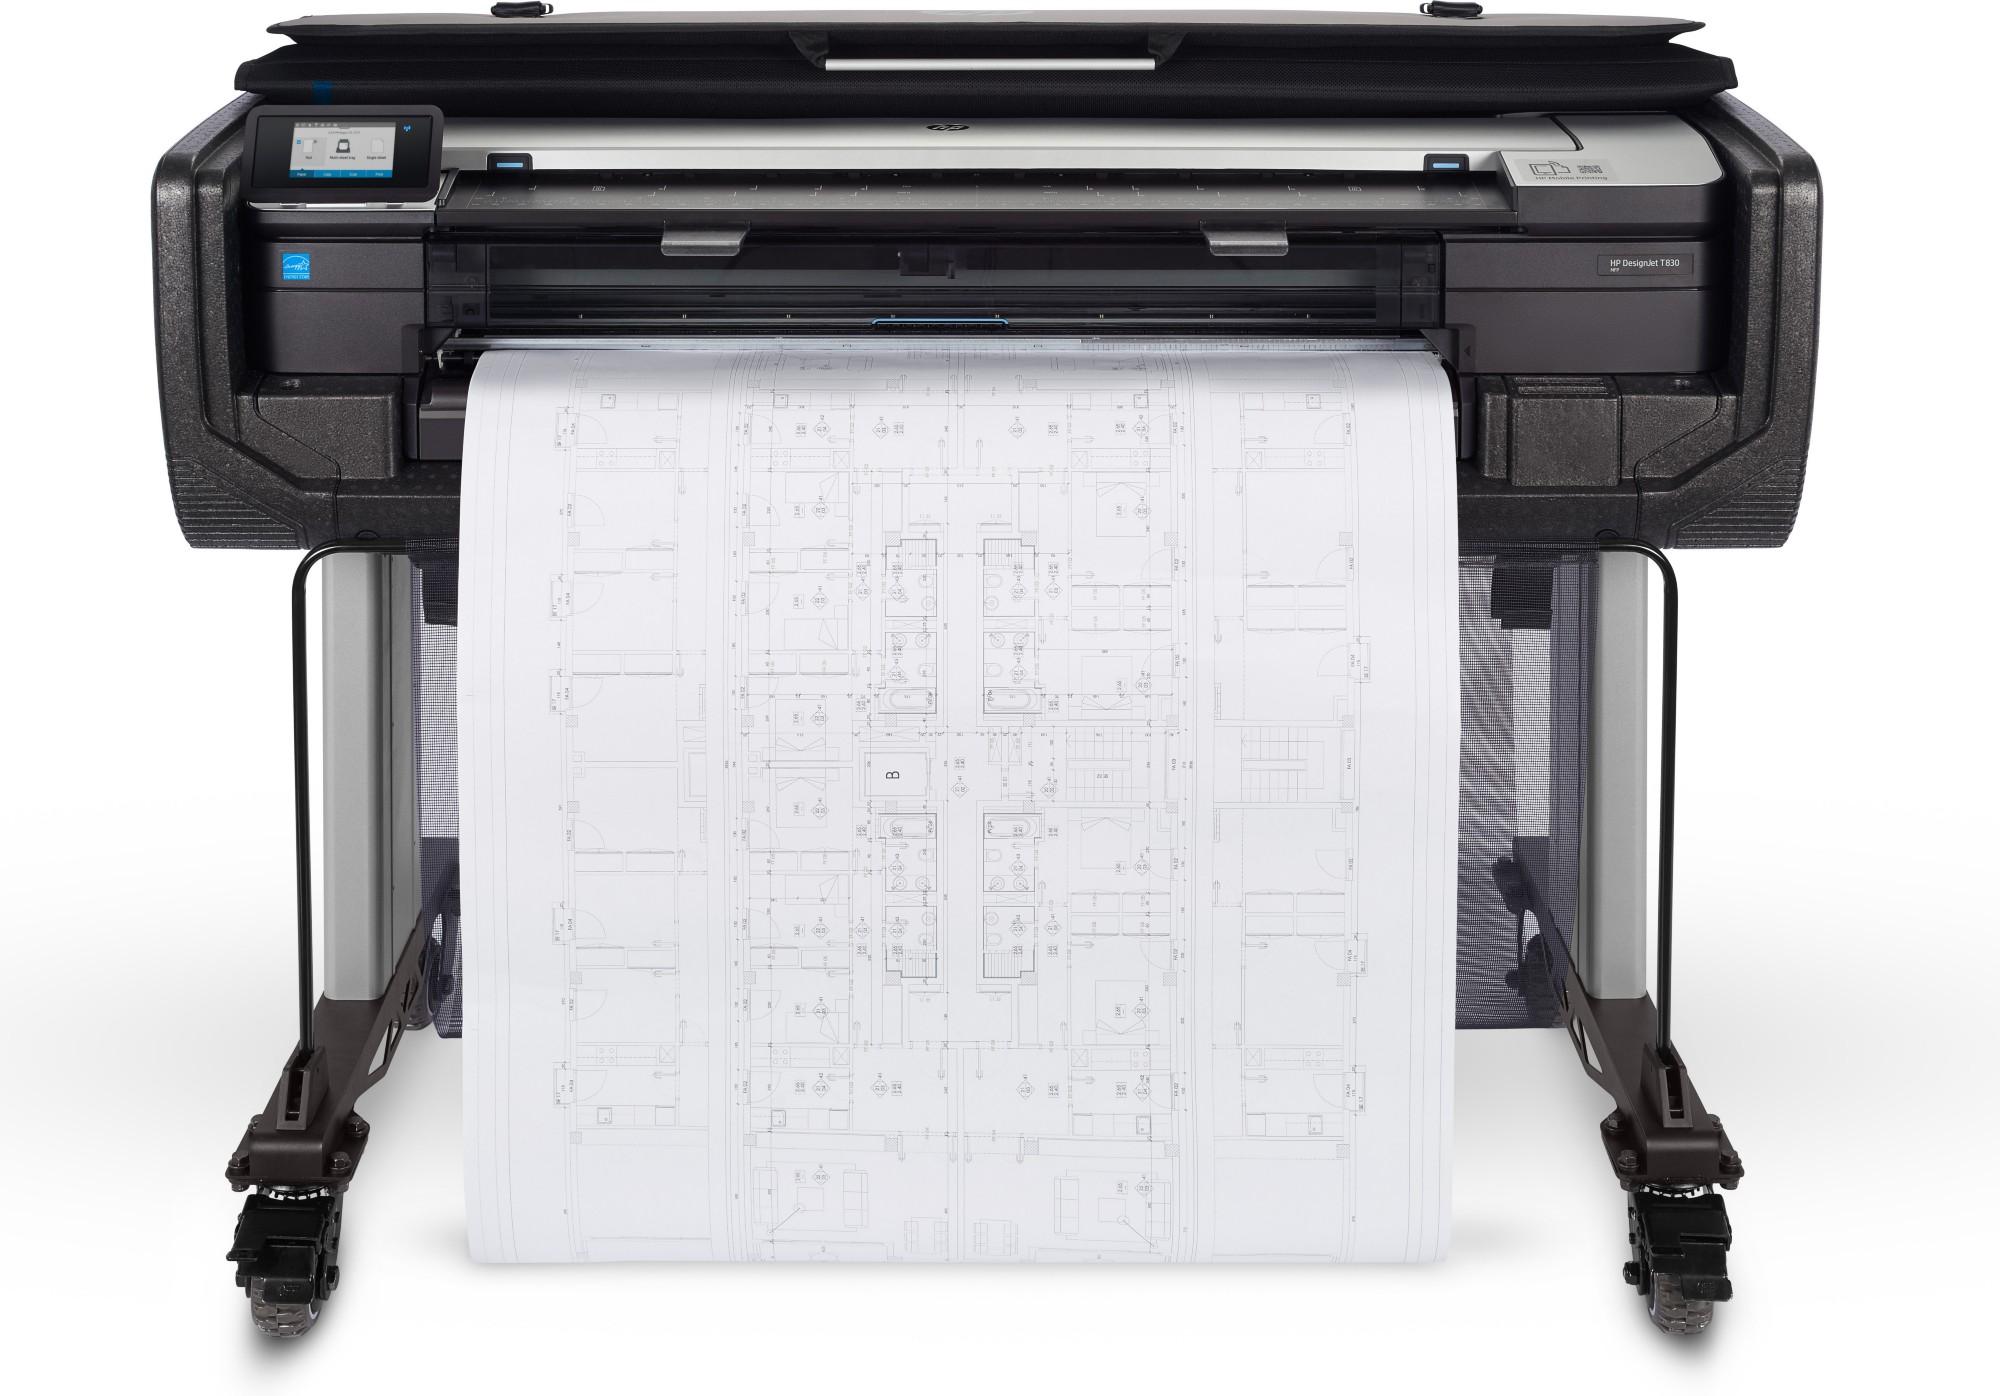 HP Designjet T830 36-in Colour 2400 x 1200DPI Thermal inkjet 914 x 1897 mm Wi-Fi large format printer